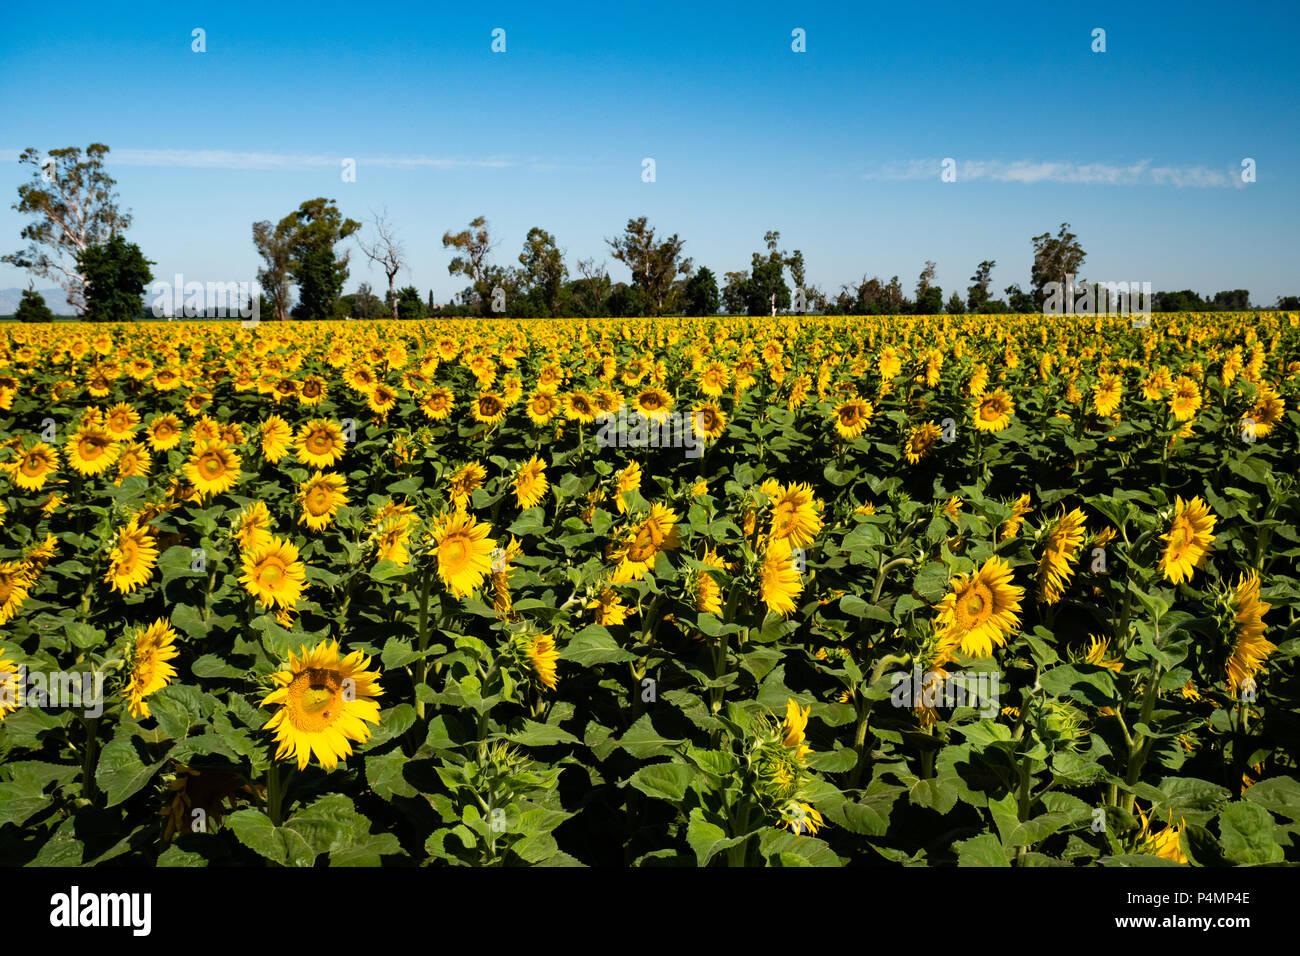 Sunflowers Dixon, California - Stock Image